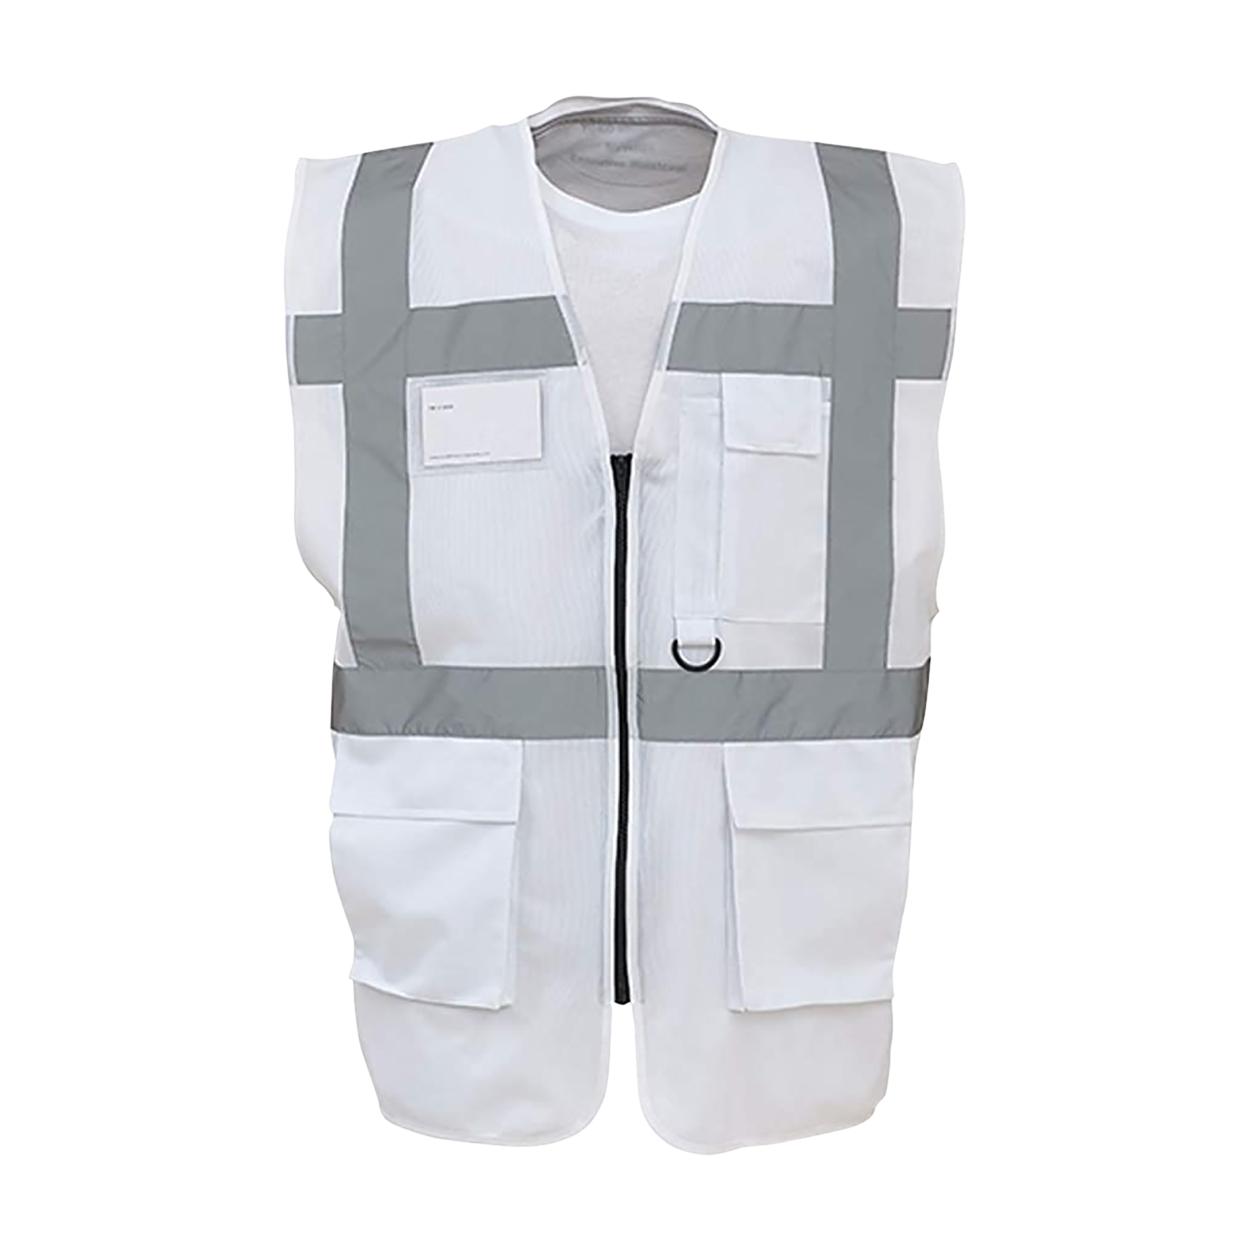 Yoko Hi-Vis Premium Executive/Manager Waistcoat / Jacket (Pack of 2) (S) (White)